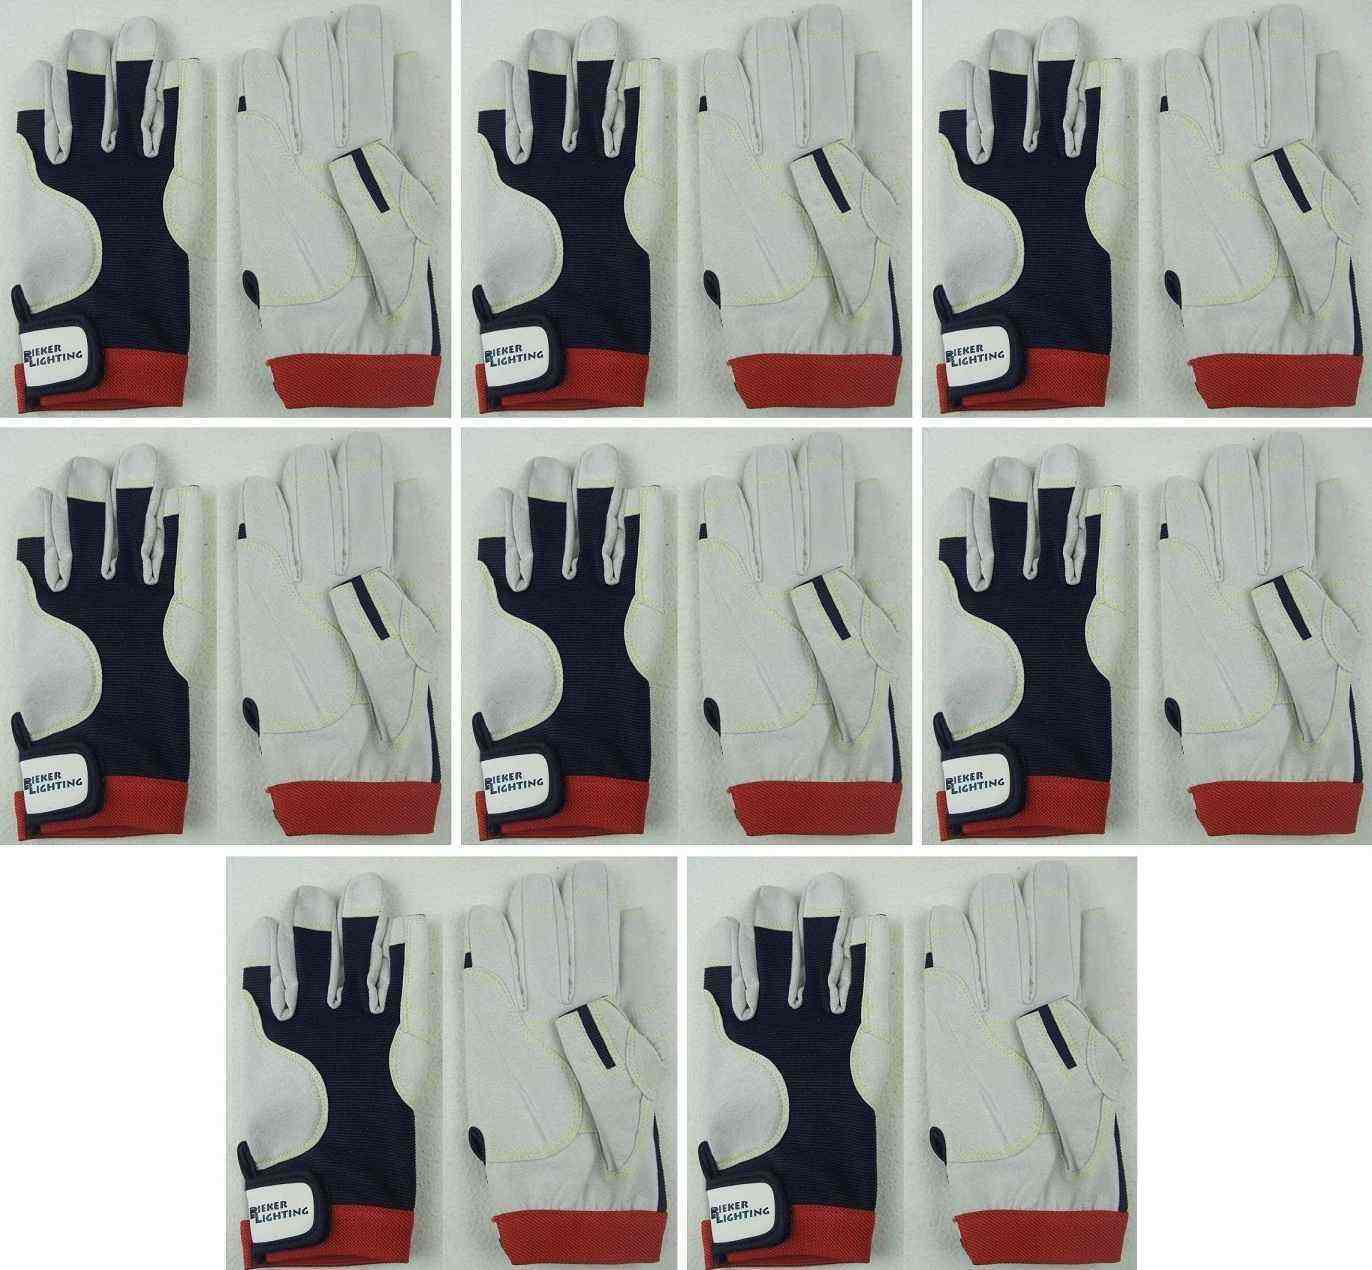 8 Paar Motorsport Handschuhe AMARA PRO Gr. M Roadiehandschuhe Fahrerhandschuhe